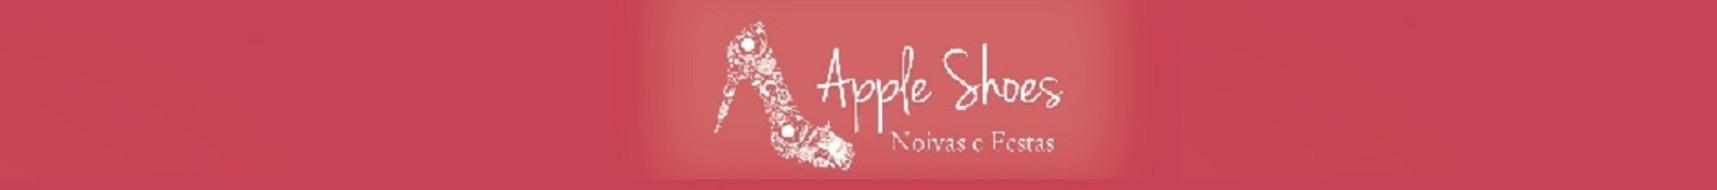 AppleShoes